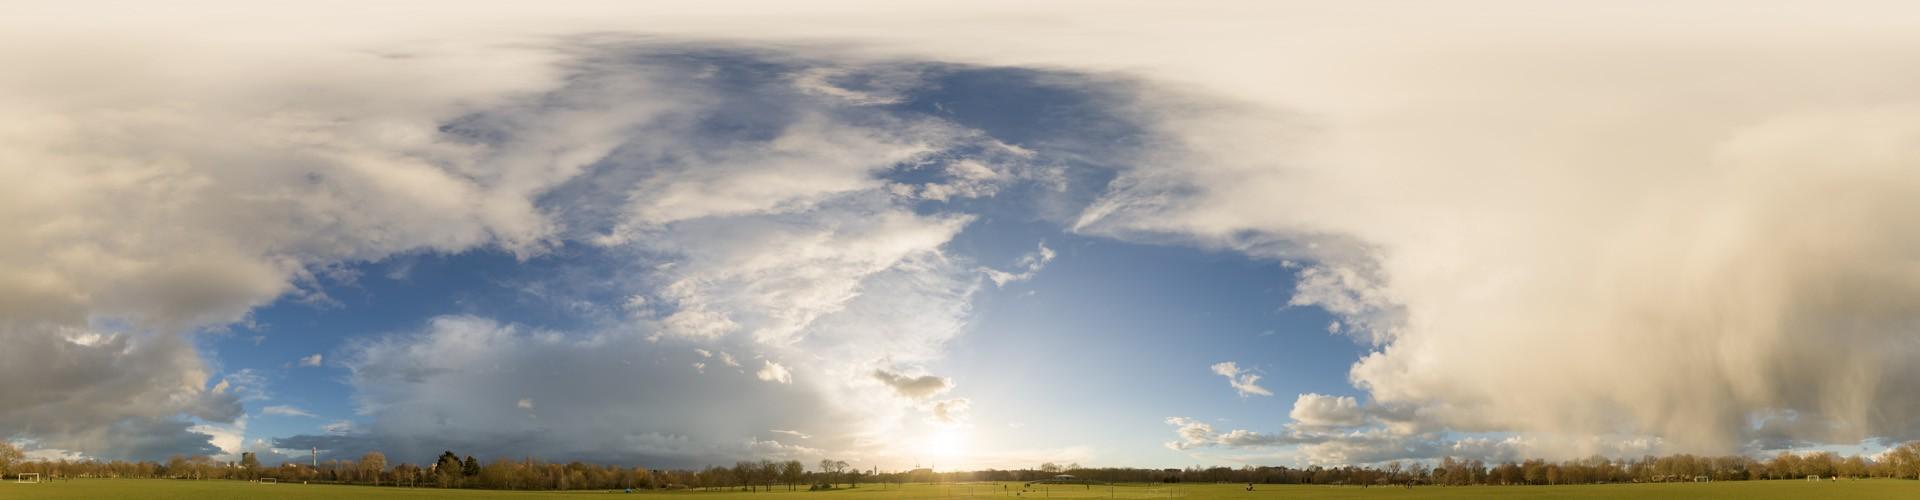 Rainy Clouds 4187 (30k) HDRI